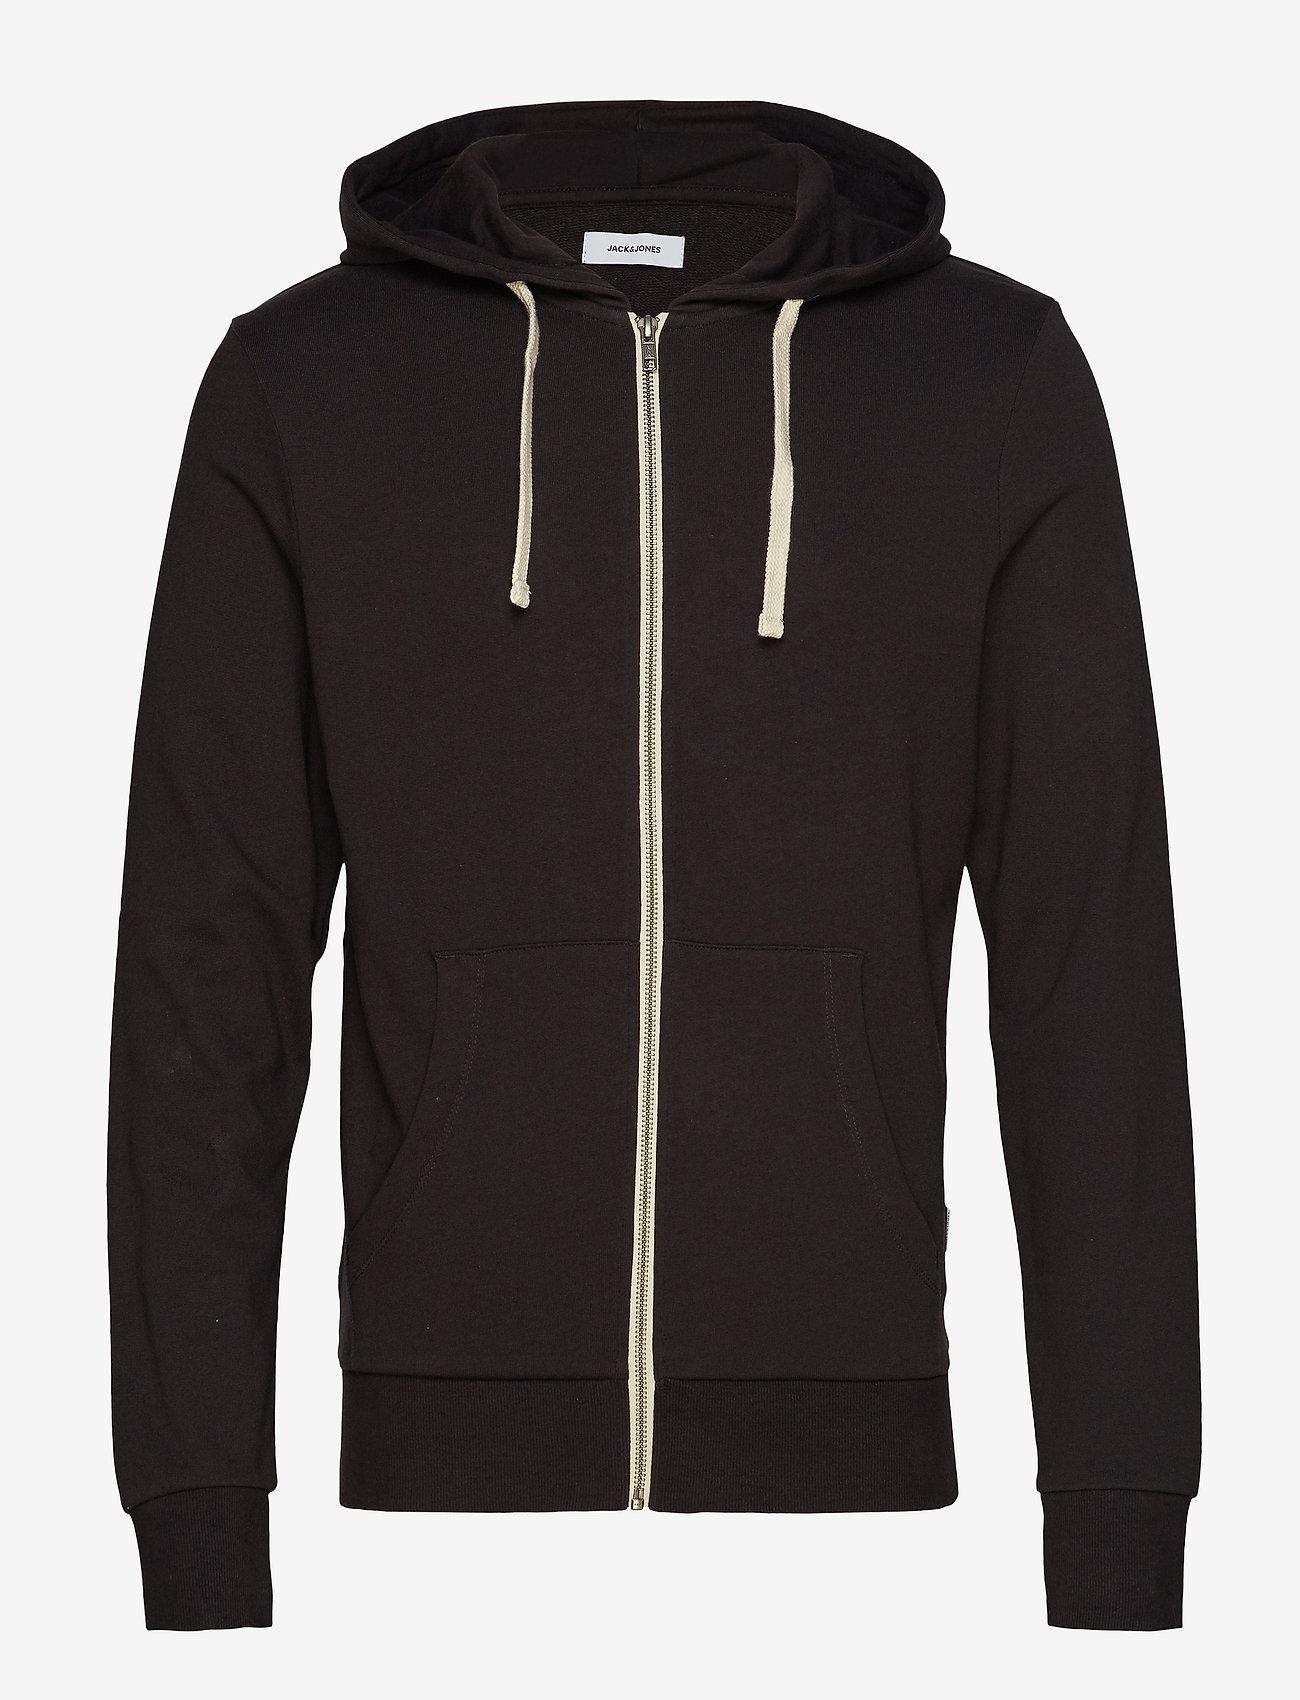 Jack & Jones - JJEHOLMEN SWEAT ZIP HOOD NOOS - basic sweatshirts - black - 0